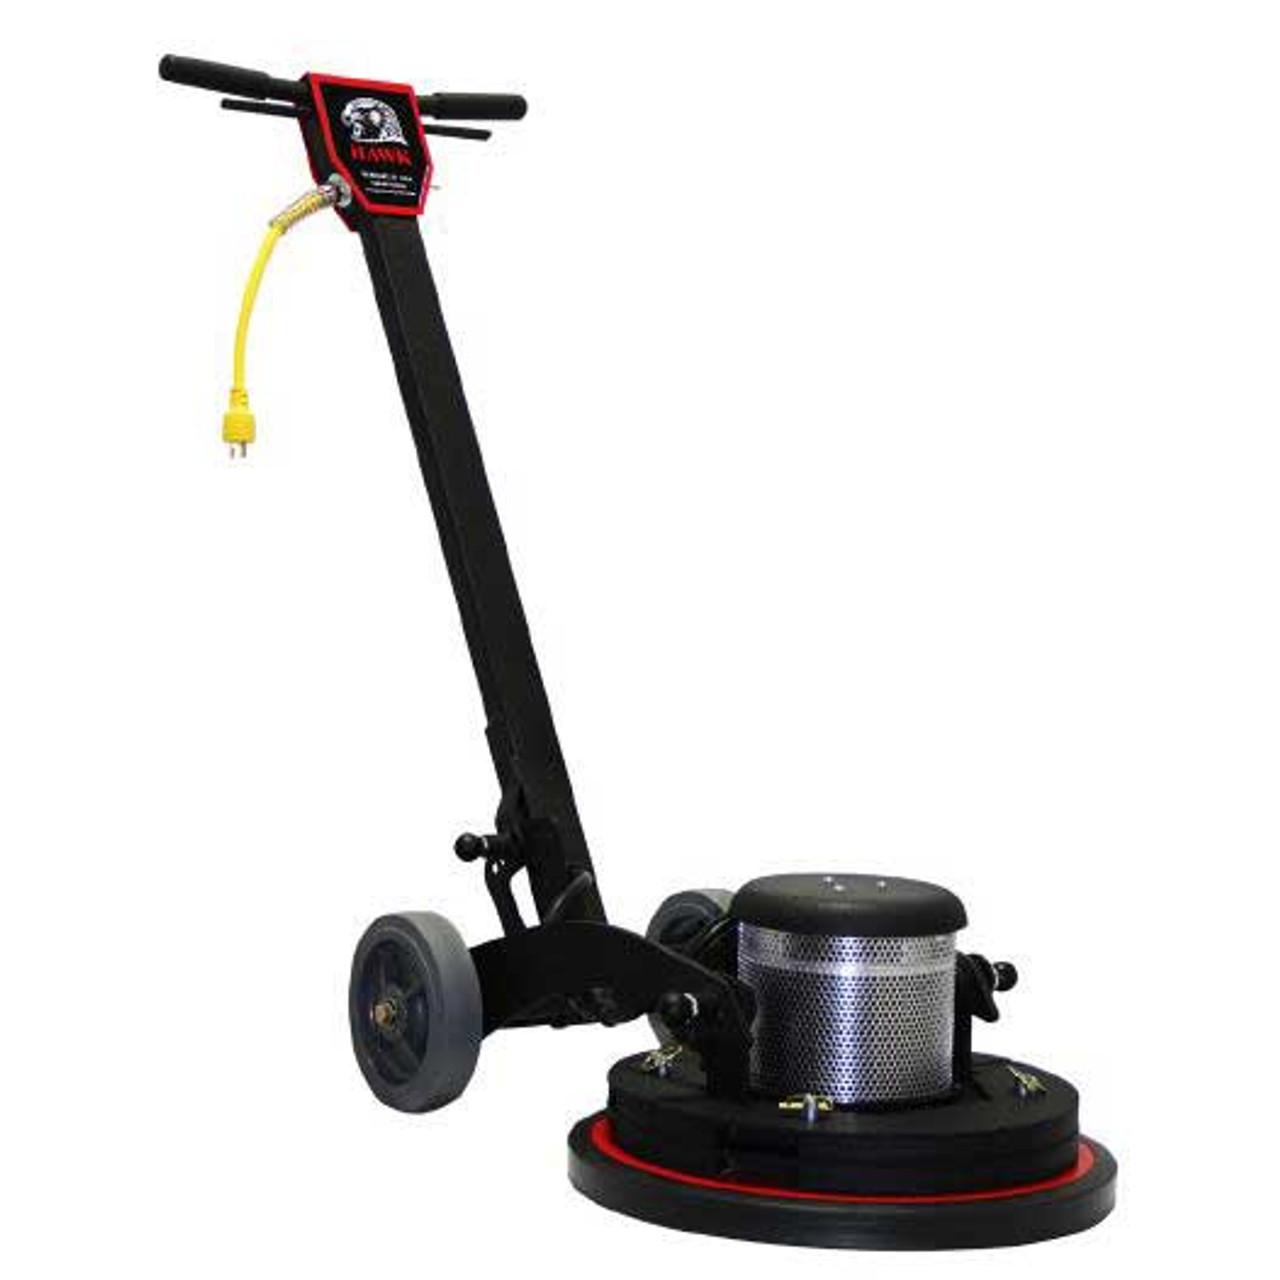 high machine rental floors equipment buffer polisher ga low inch at in athens oconee inc floor rentals speed